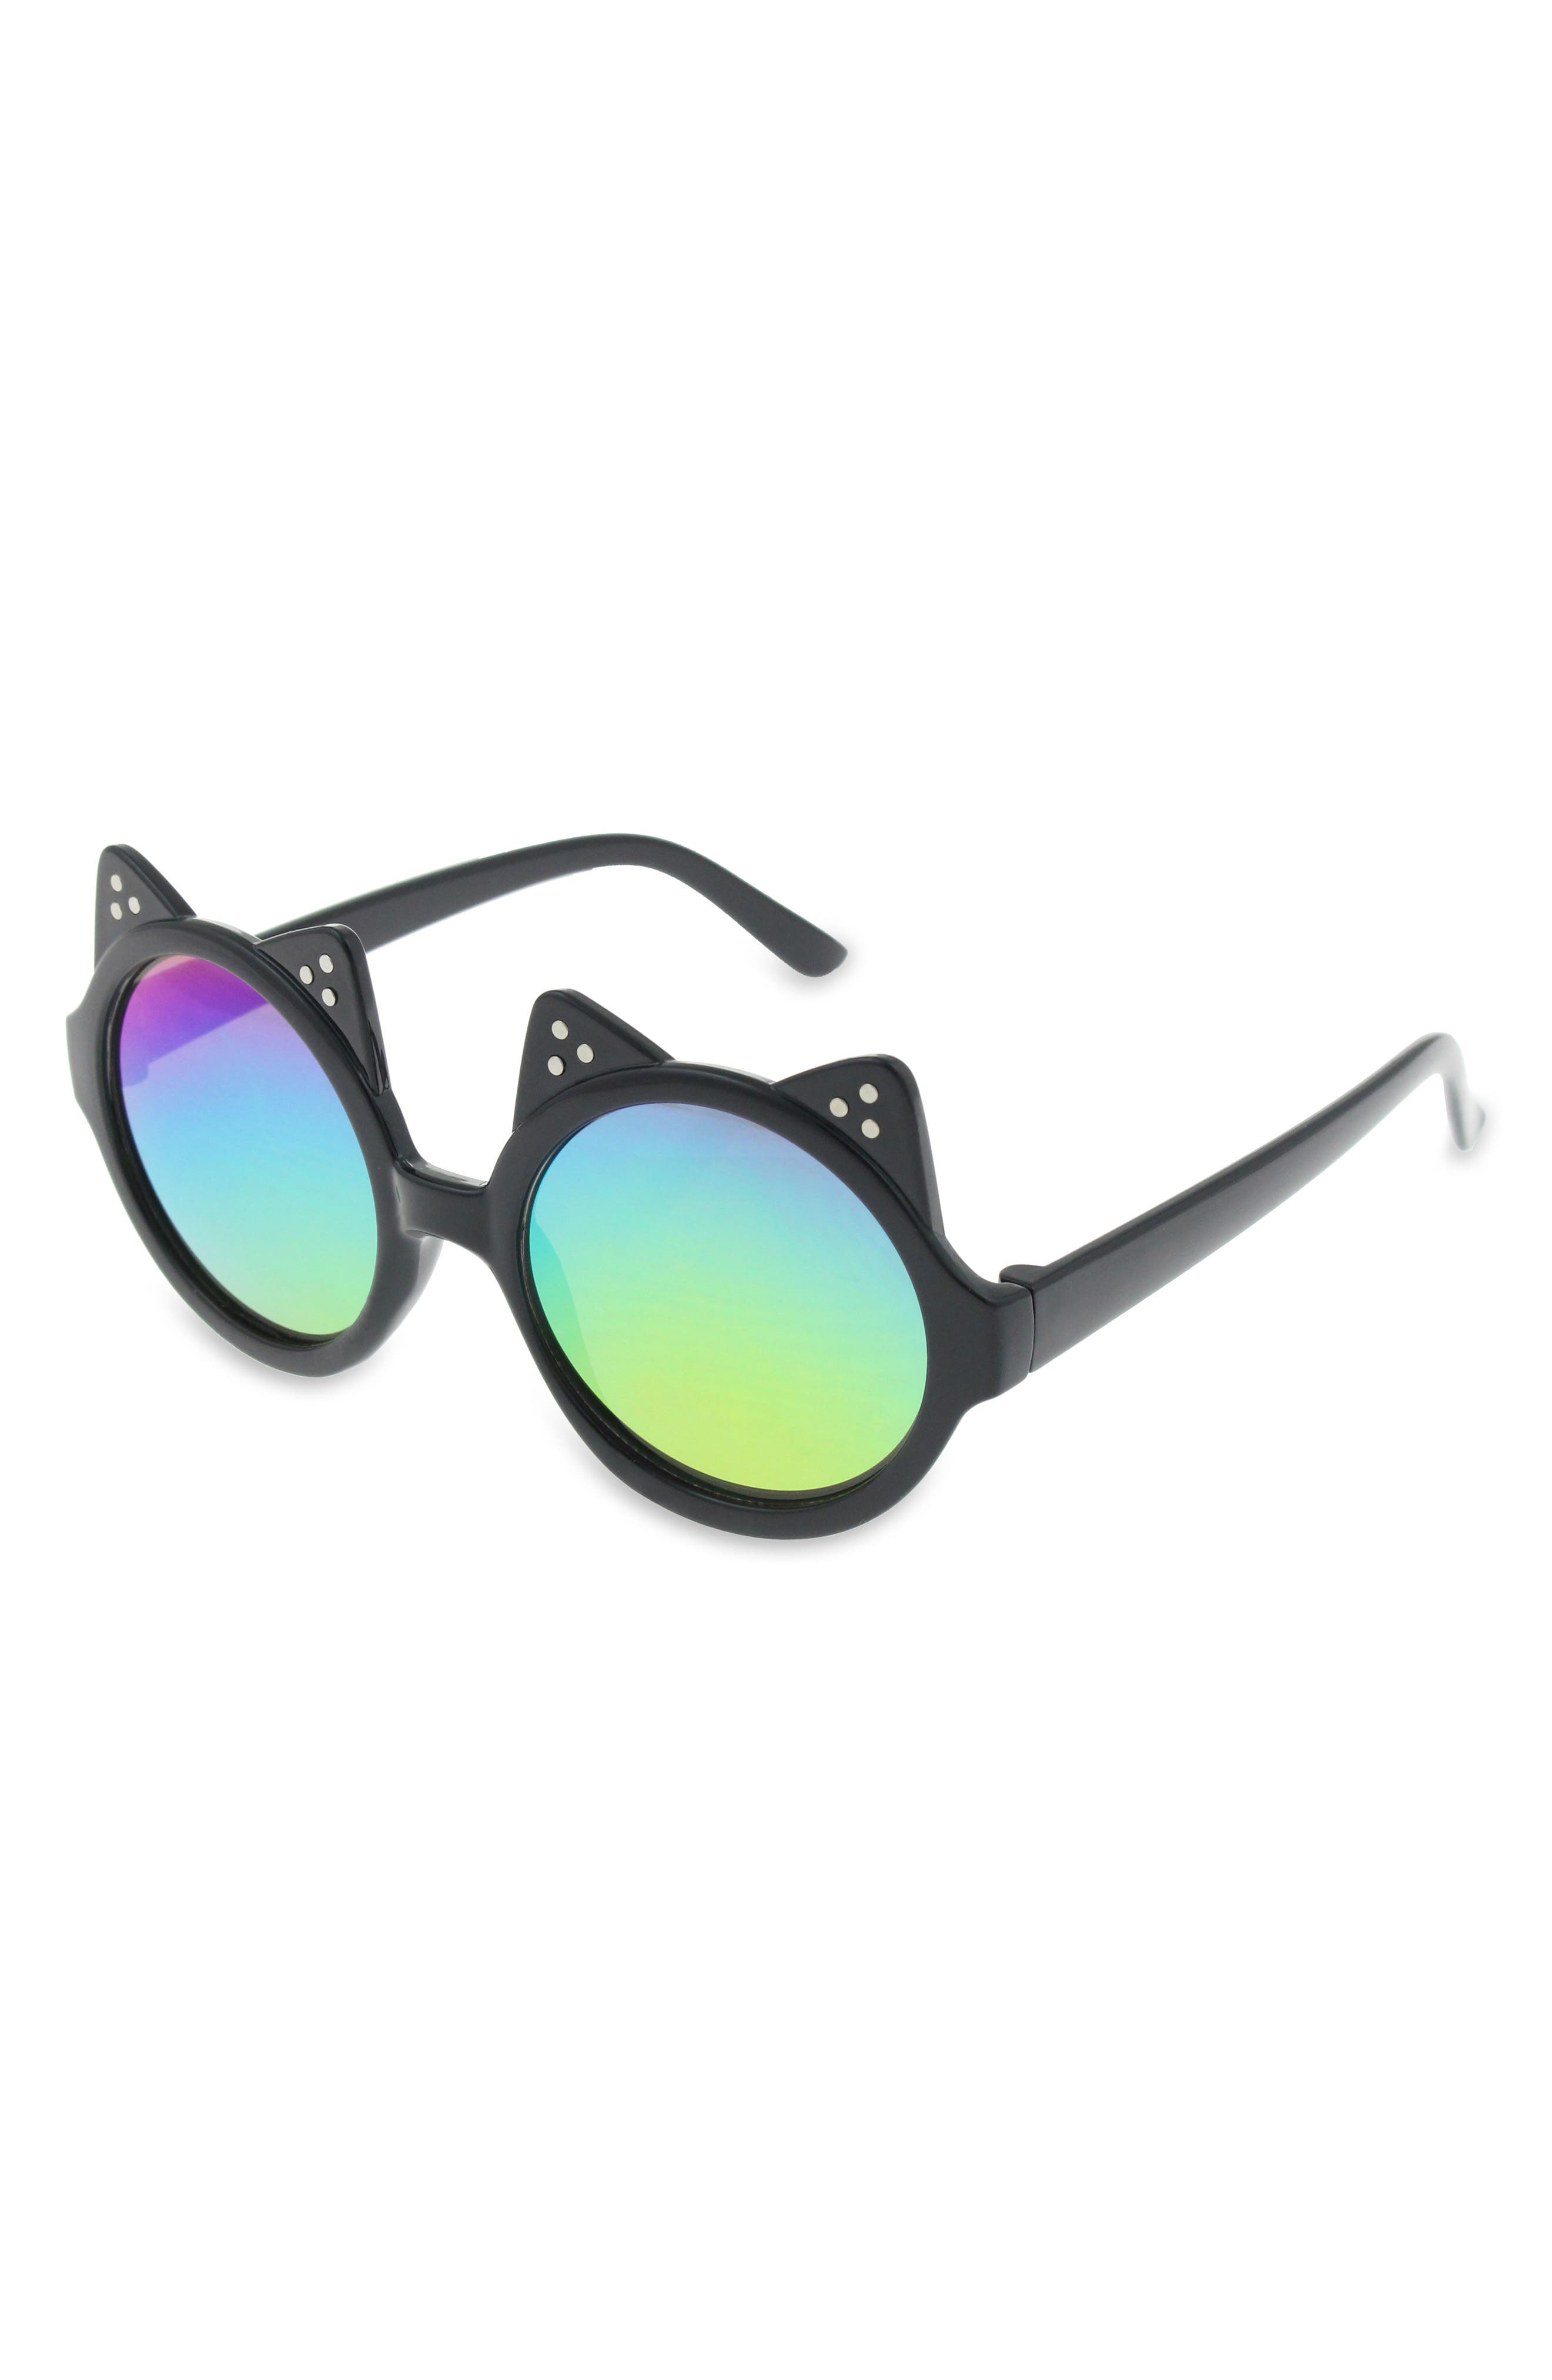 Main Image - Capelli New York Double Cat Ear Sunglasses (Girls)